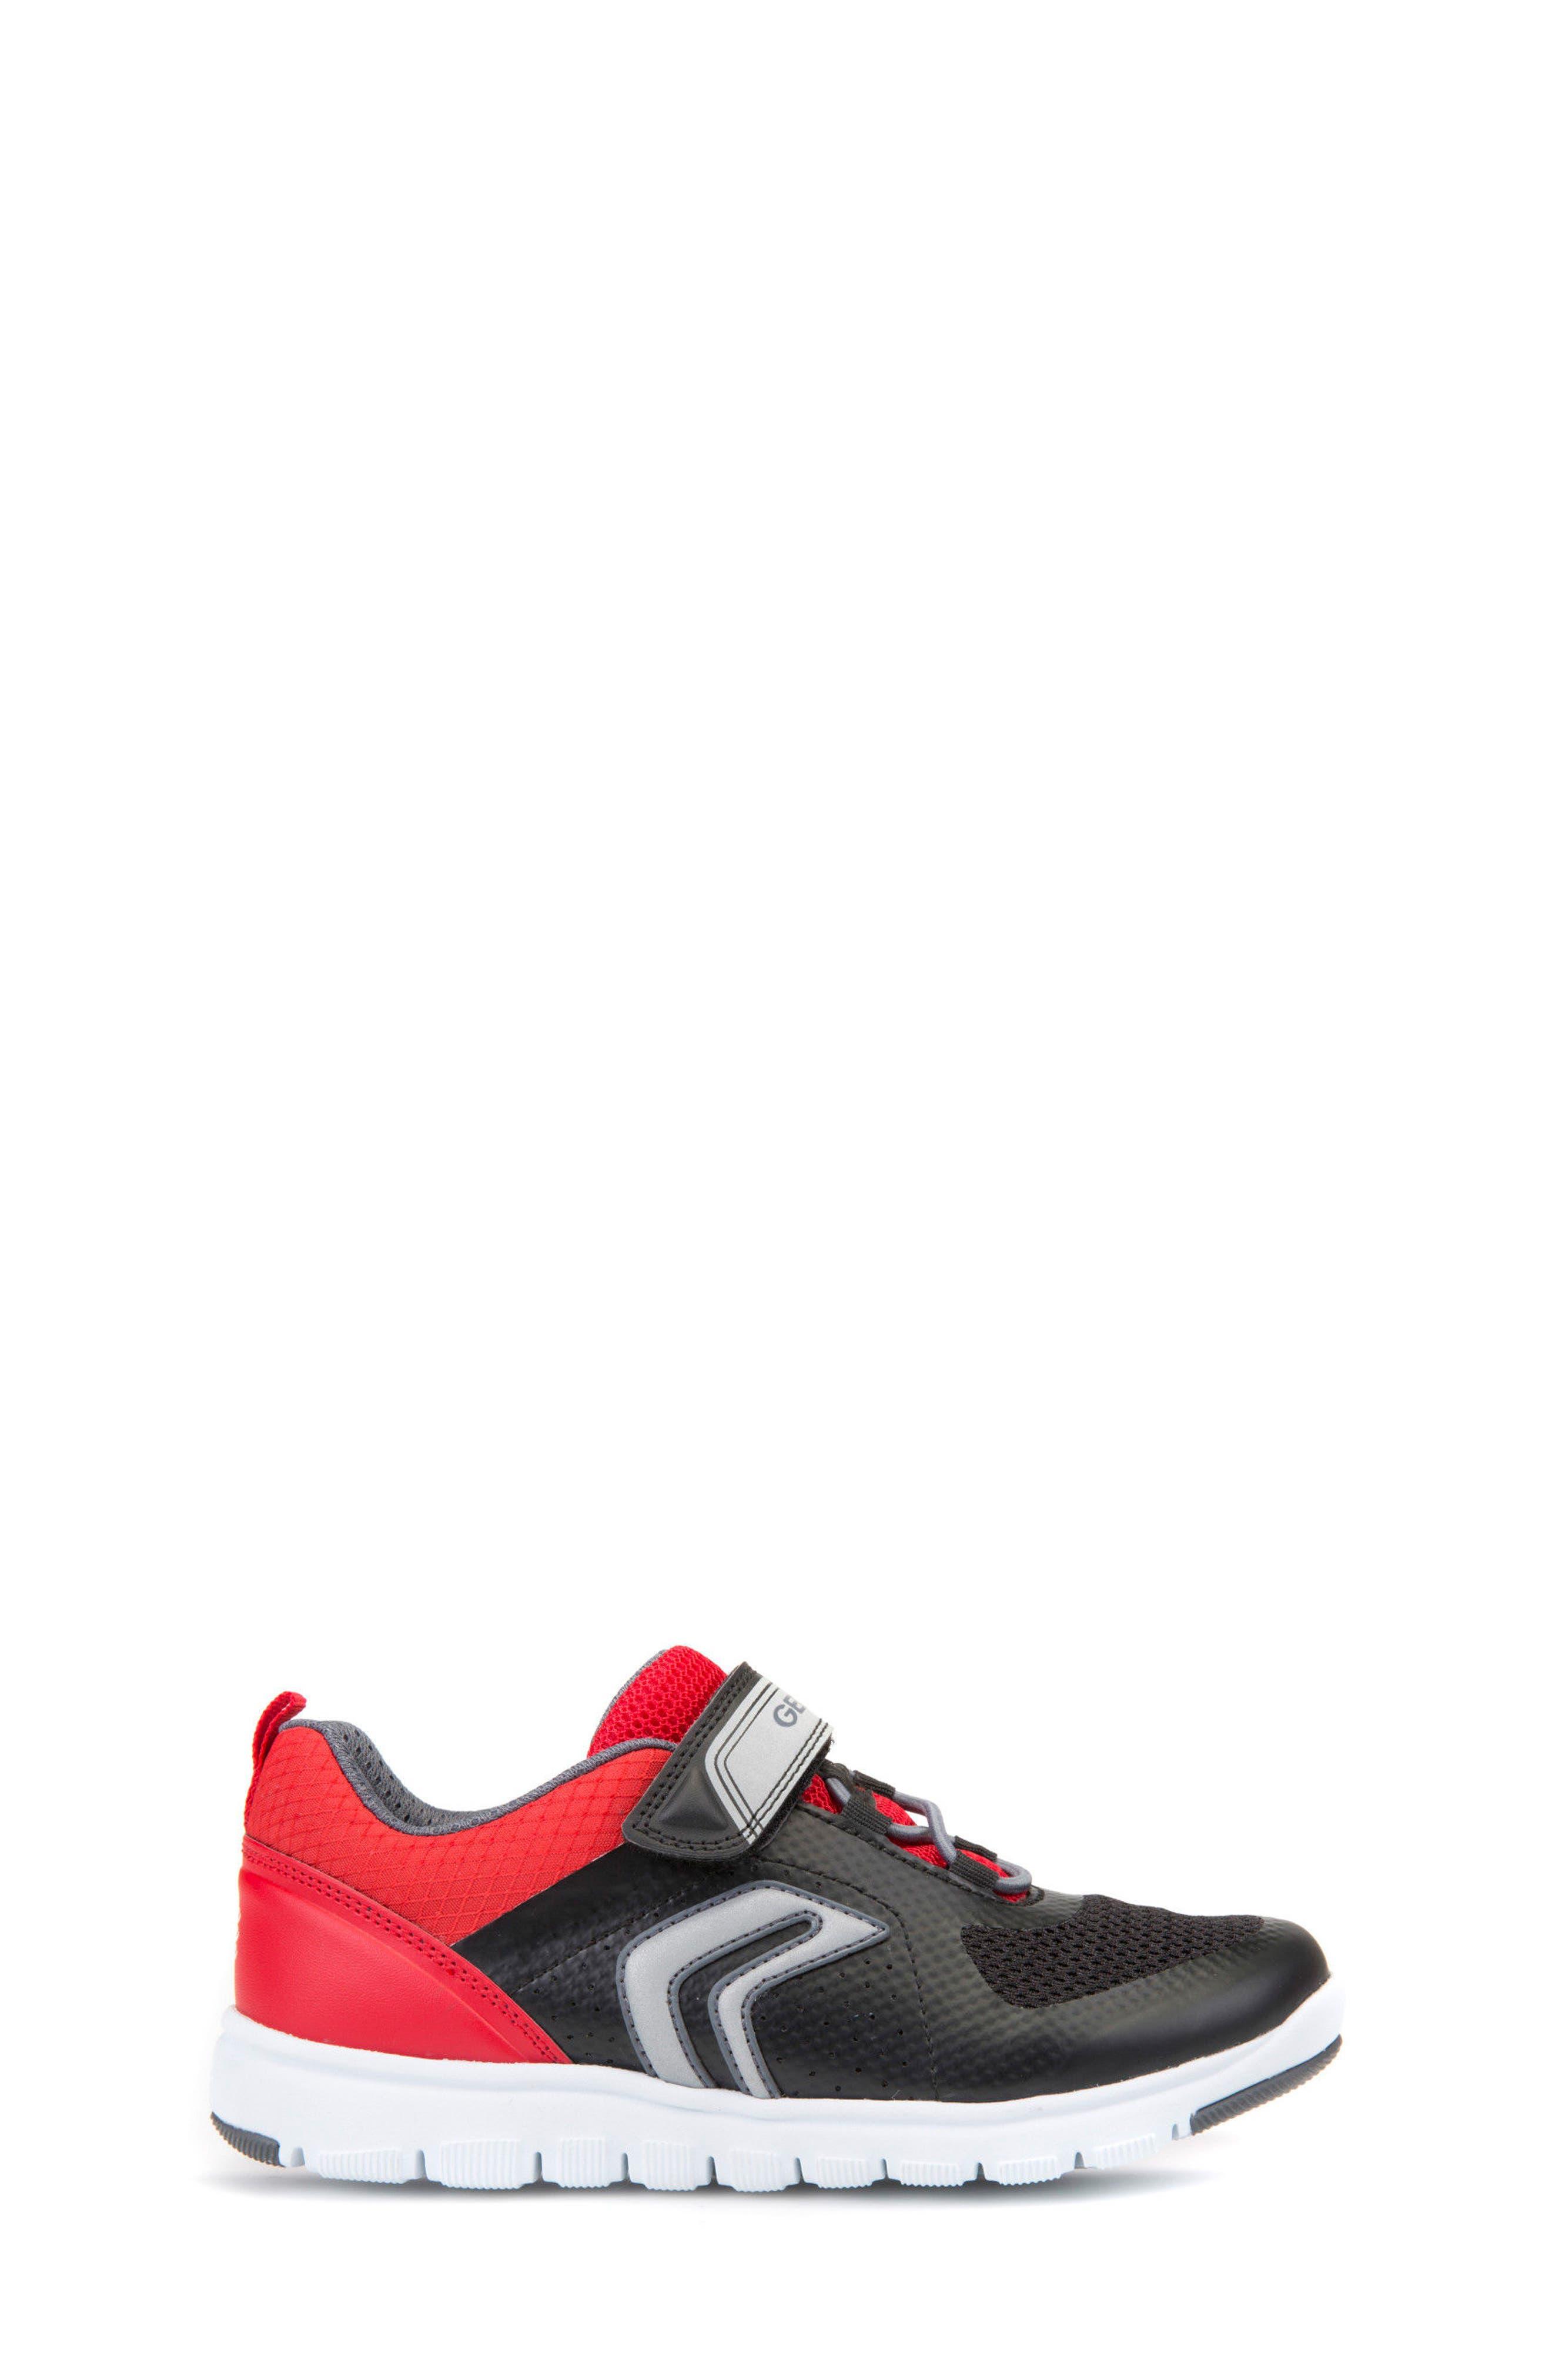 Xunday Low Top Sneaker,                             Alternate thumbnail 3, color,                             001